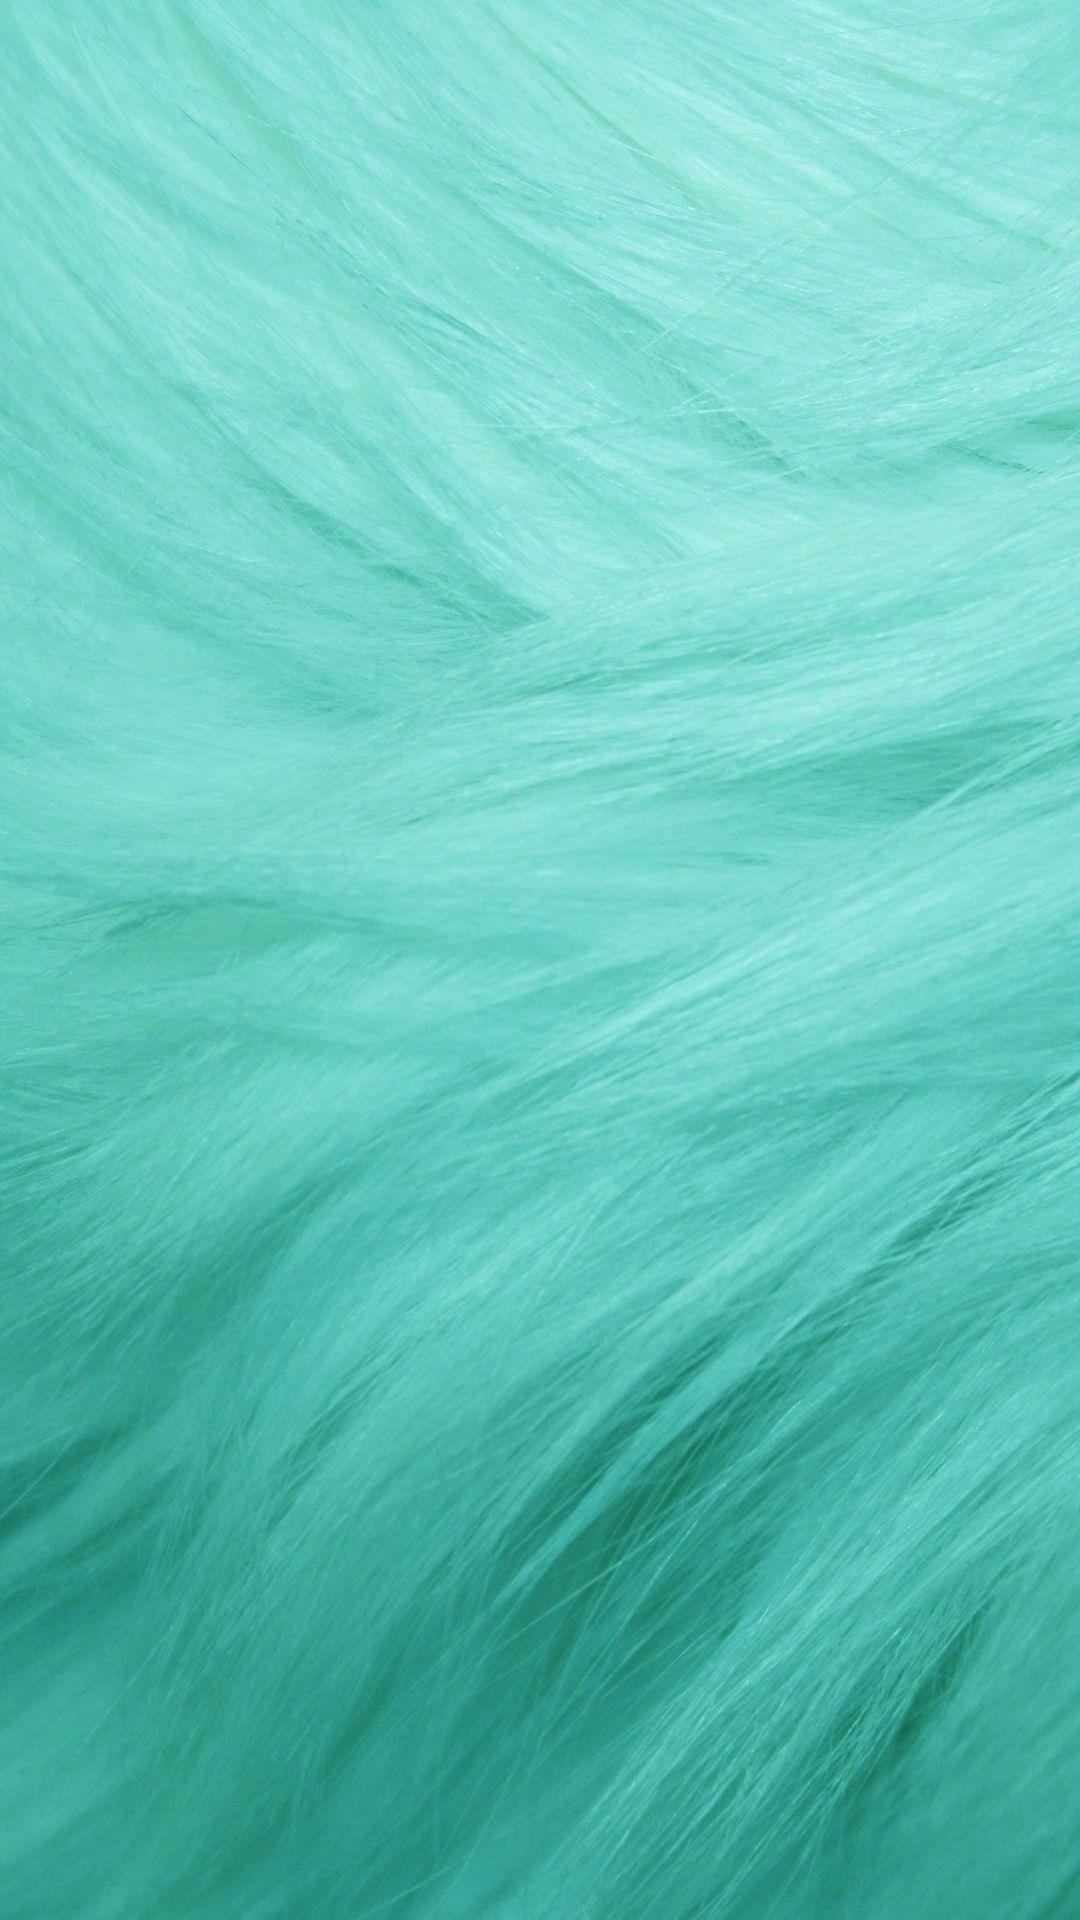 Mint Green Wallpaper Iphone X 293999 Hd Wallpaper